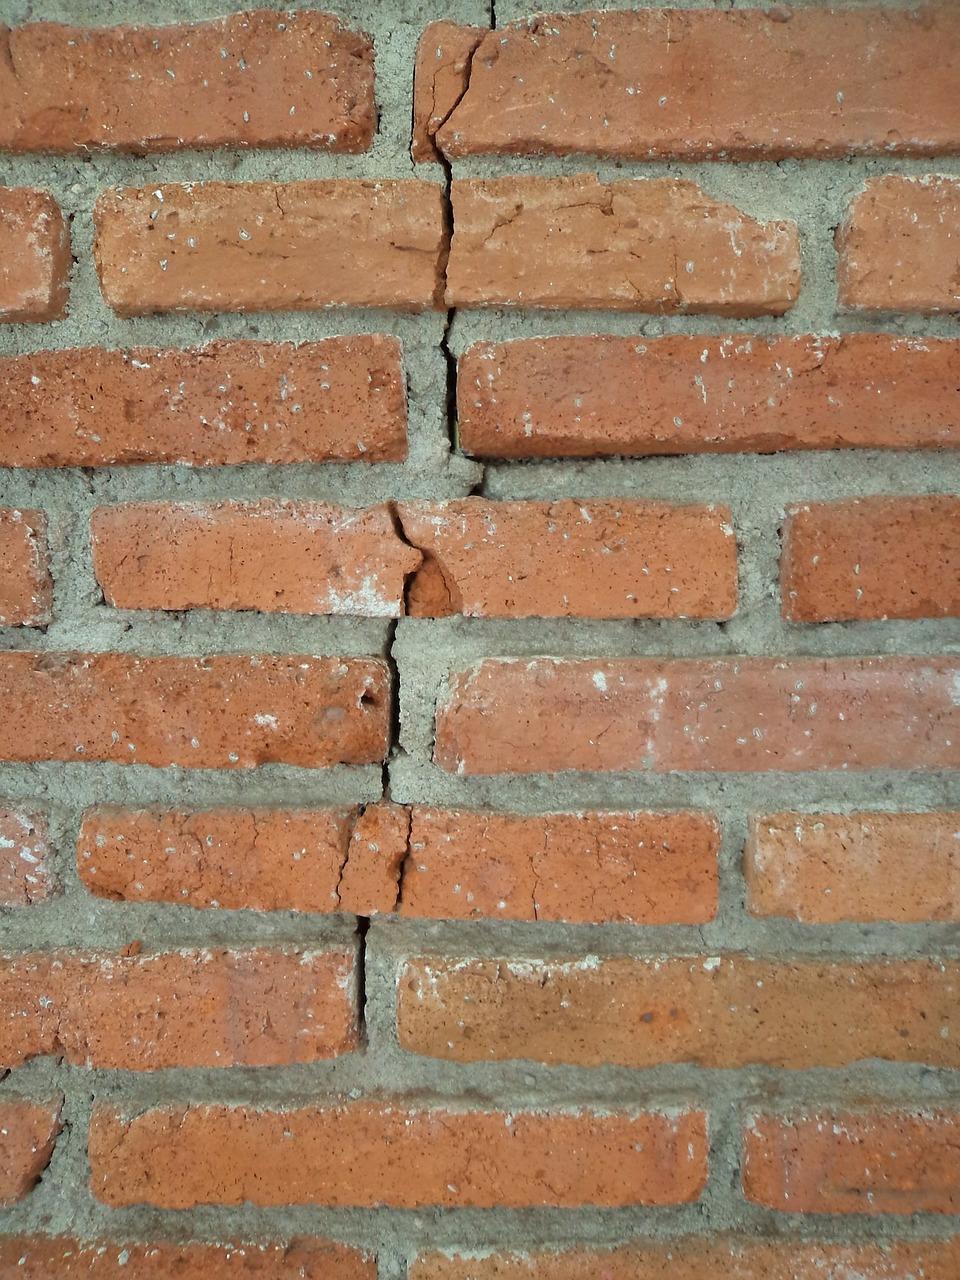 brick-215779_1280.jpg